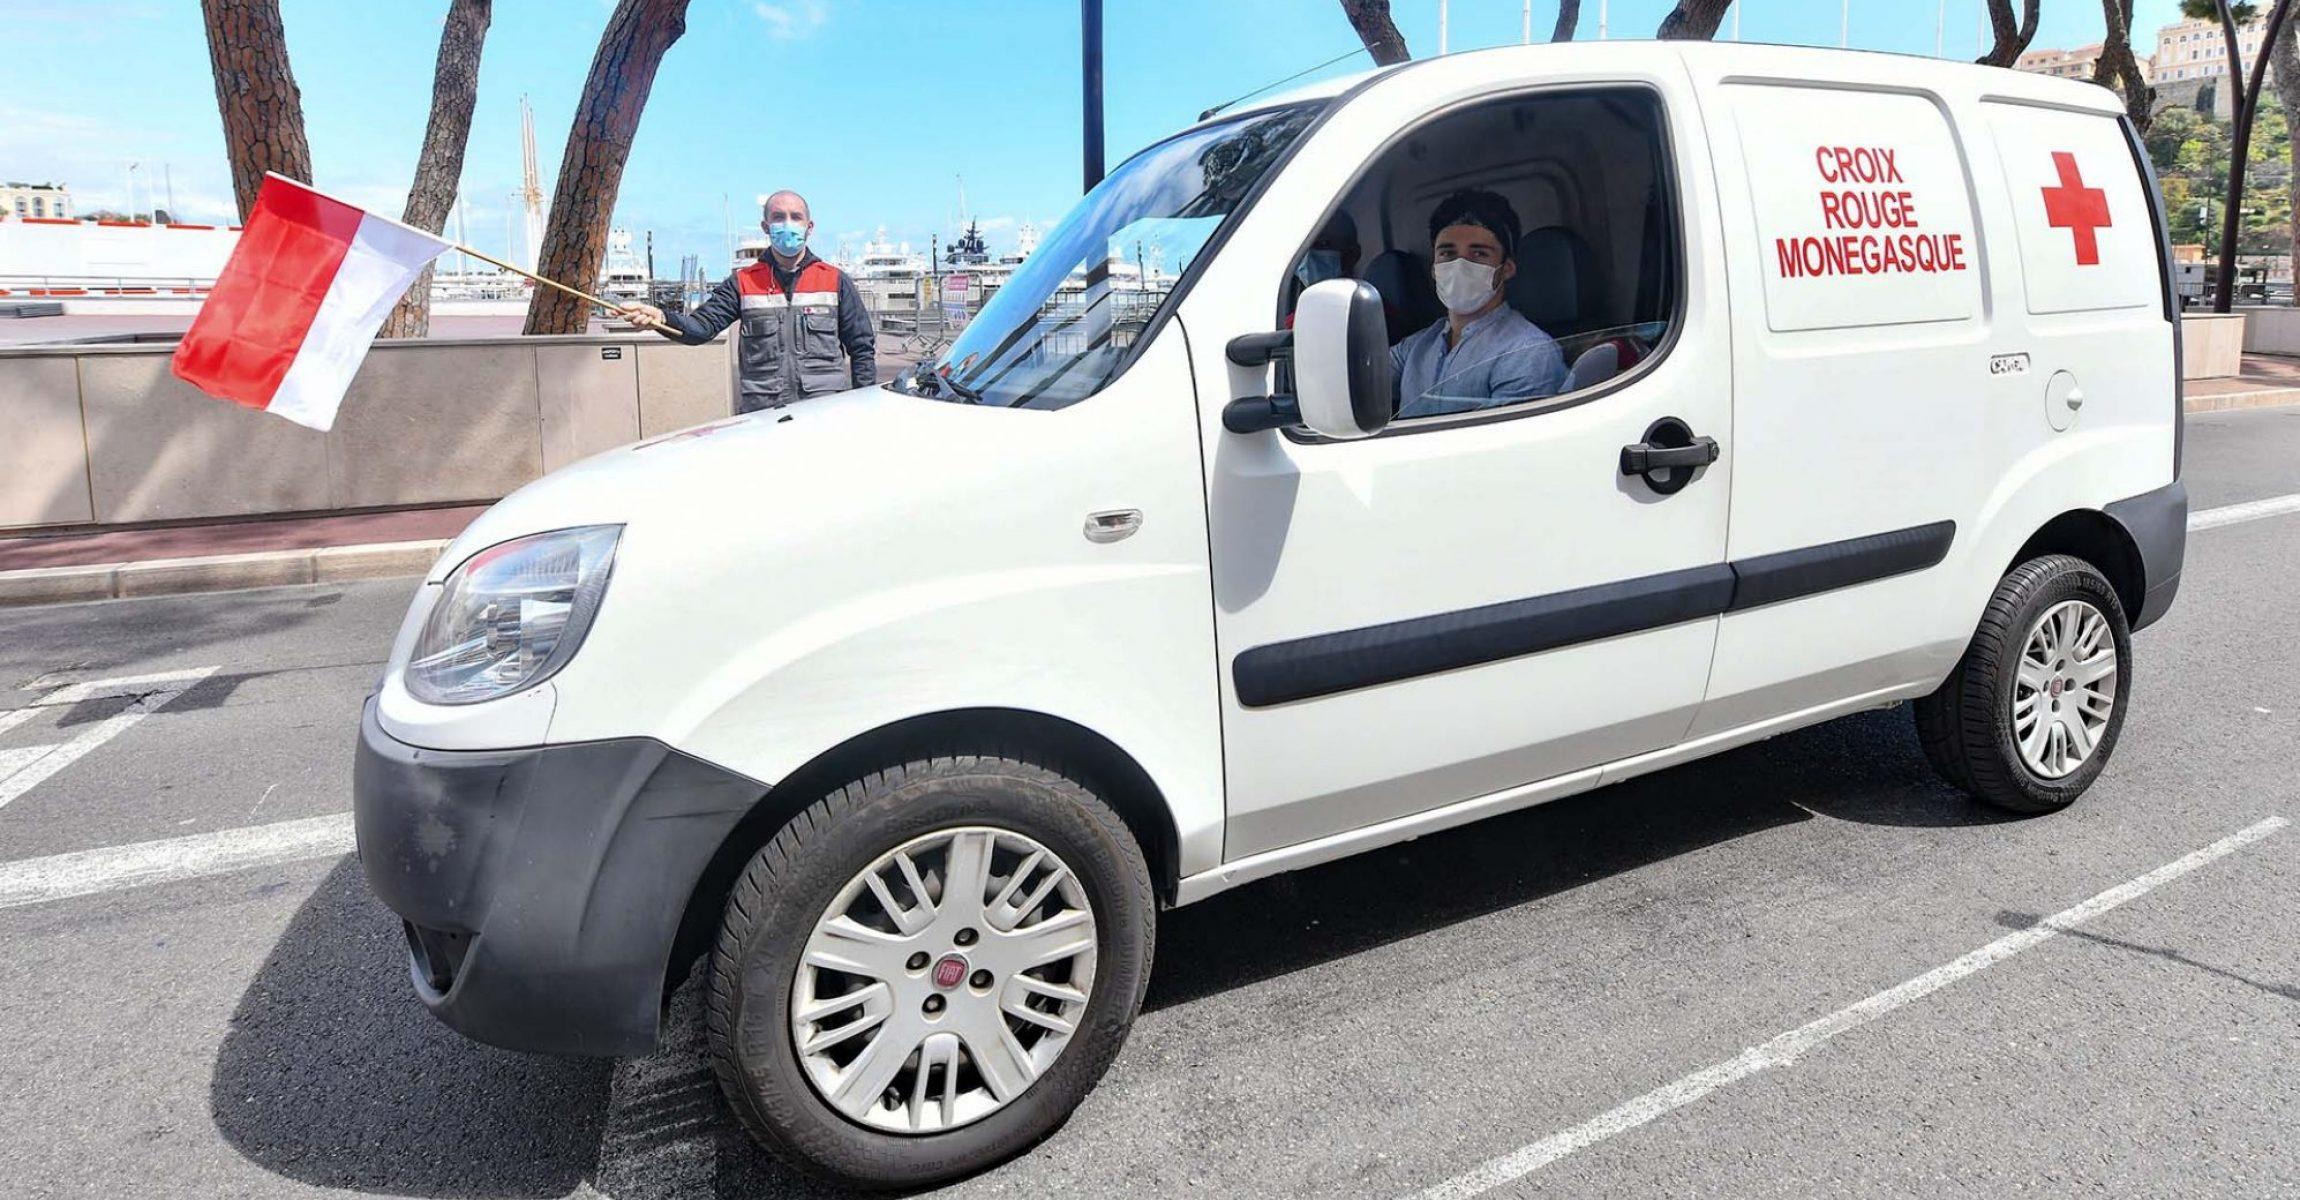 Charles Leclerc Ferrari volunteer, Manuel Vitali – Direction de la Communication - Monaco